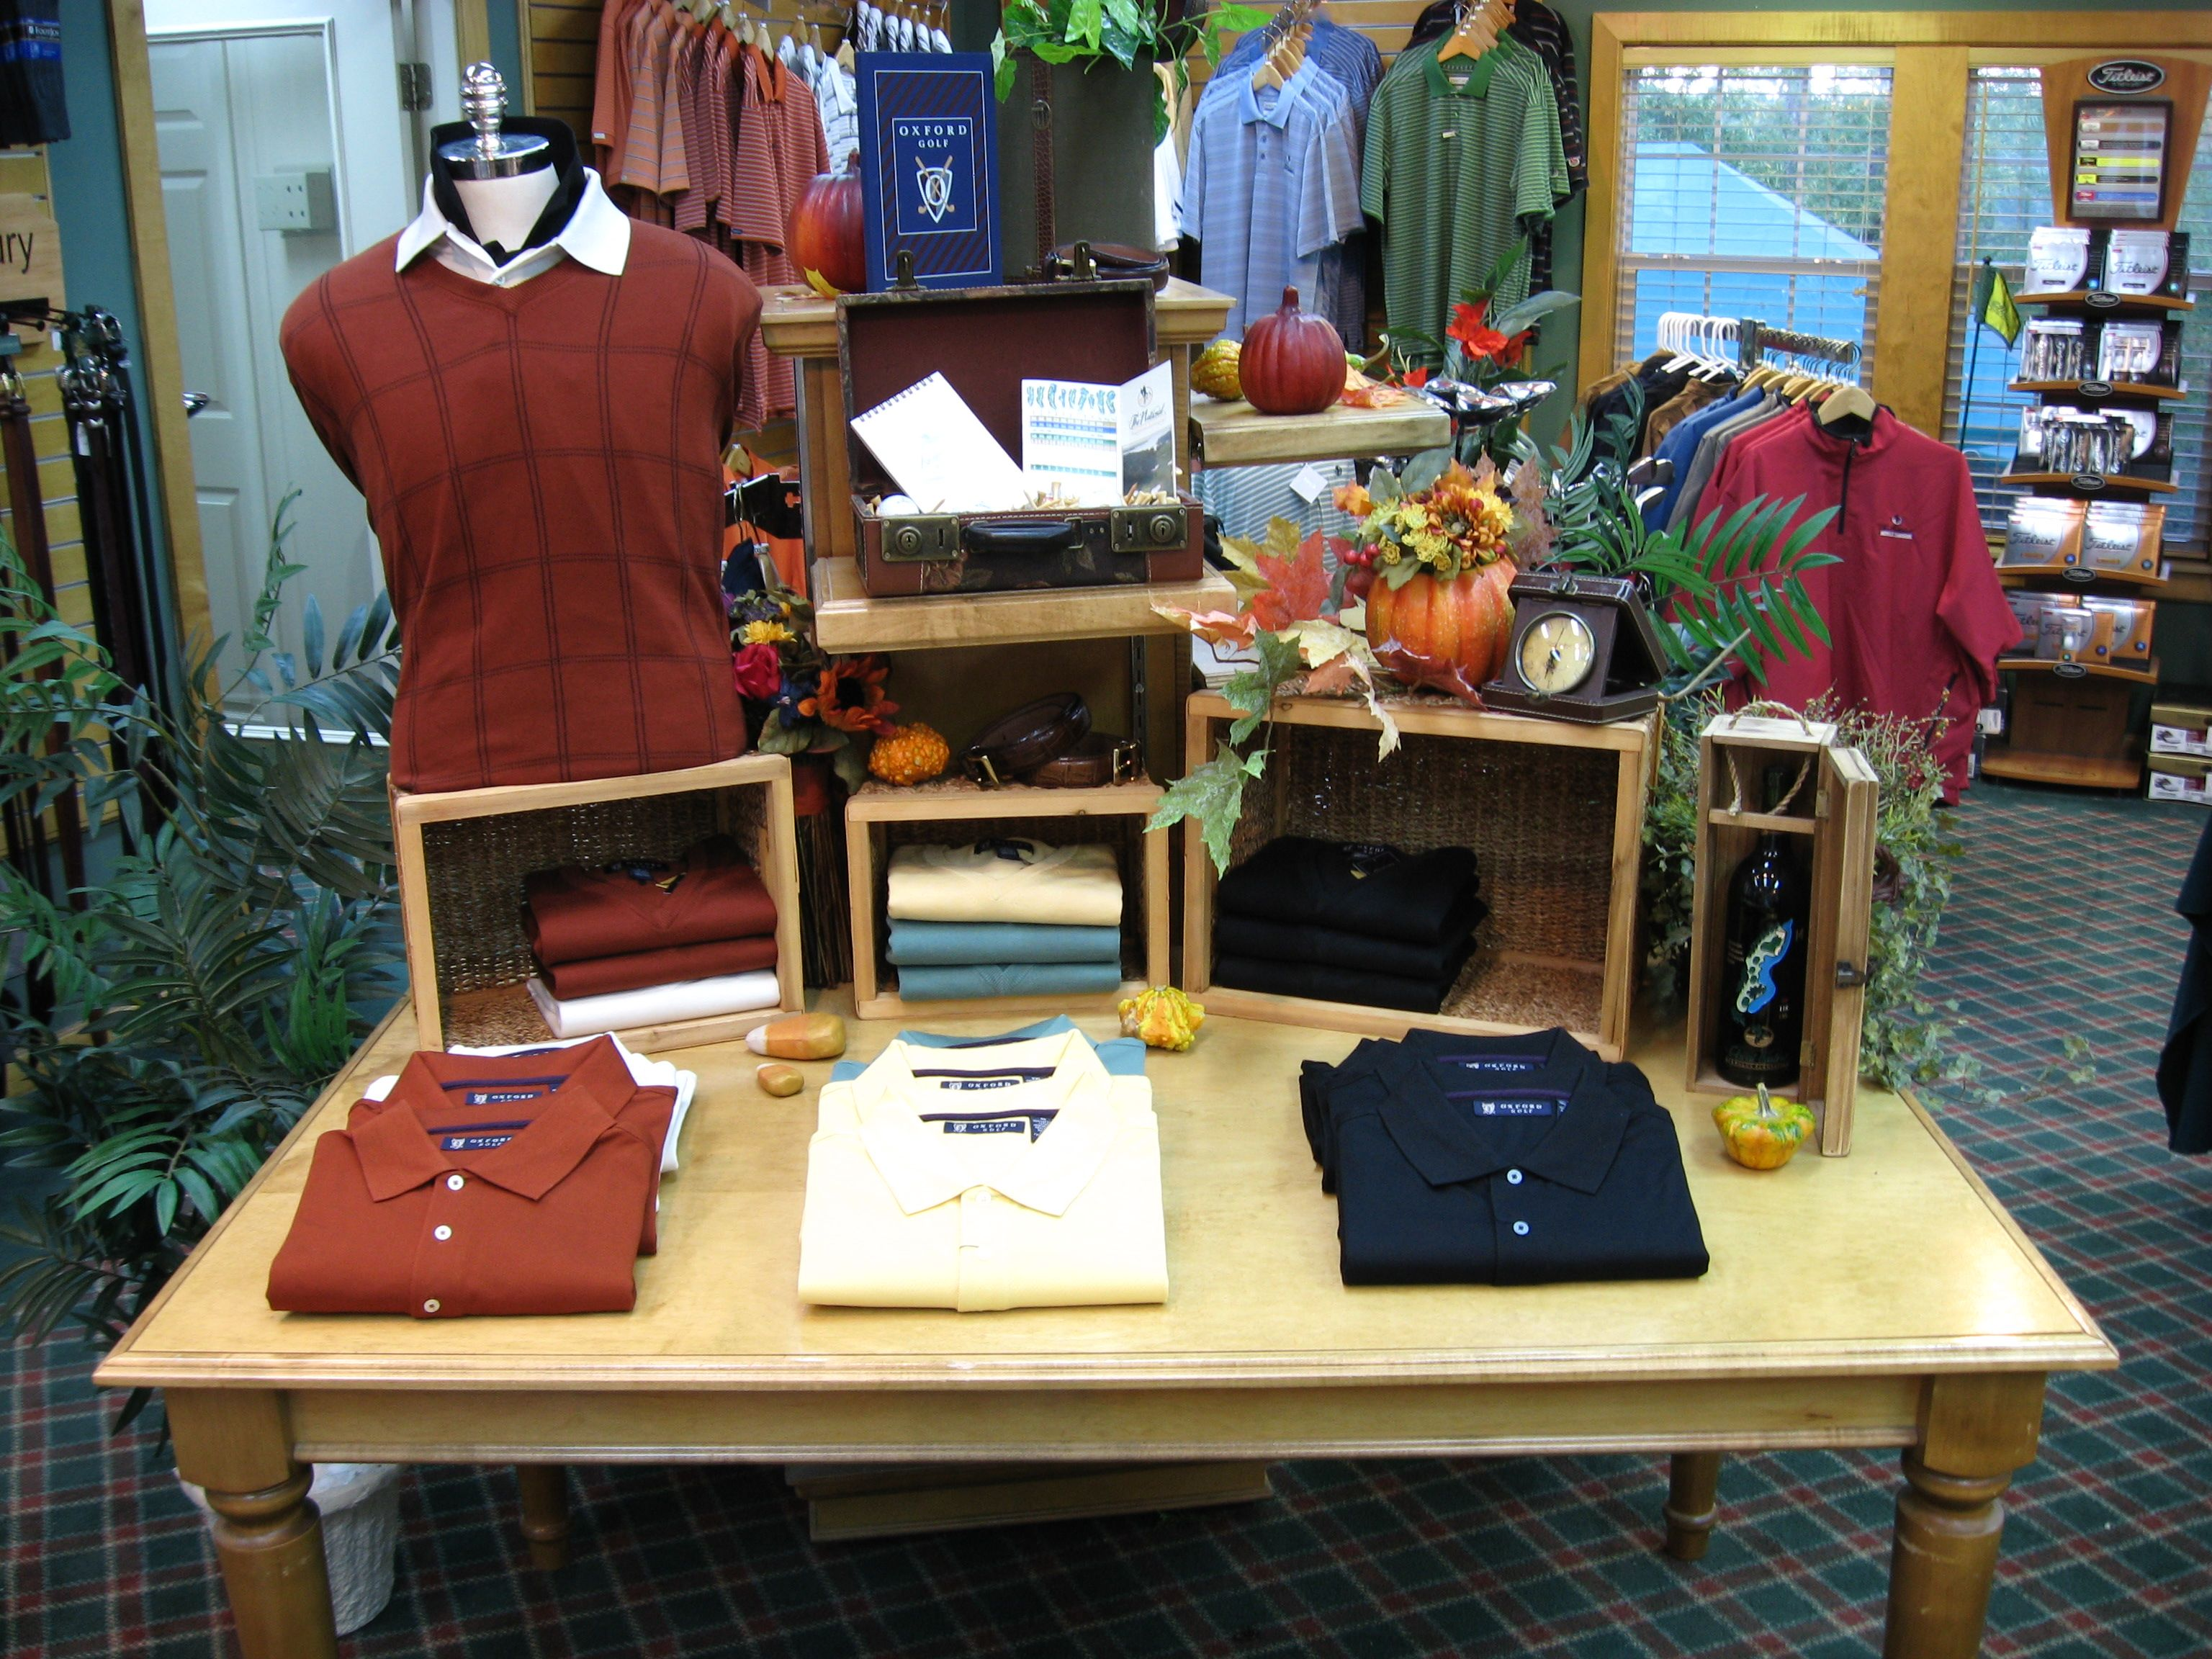 Stacked Crates Golf Pro Shop Shirt Display Merchandising Displays